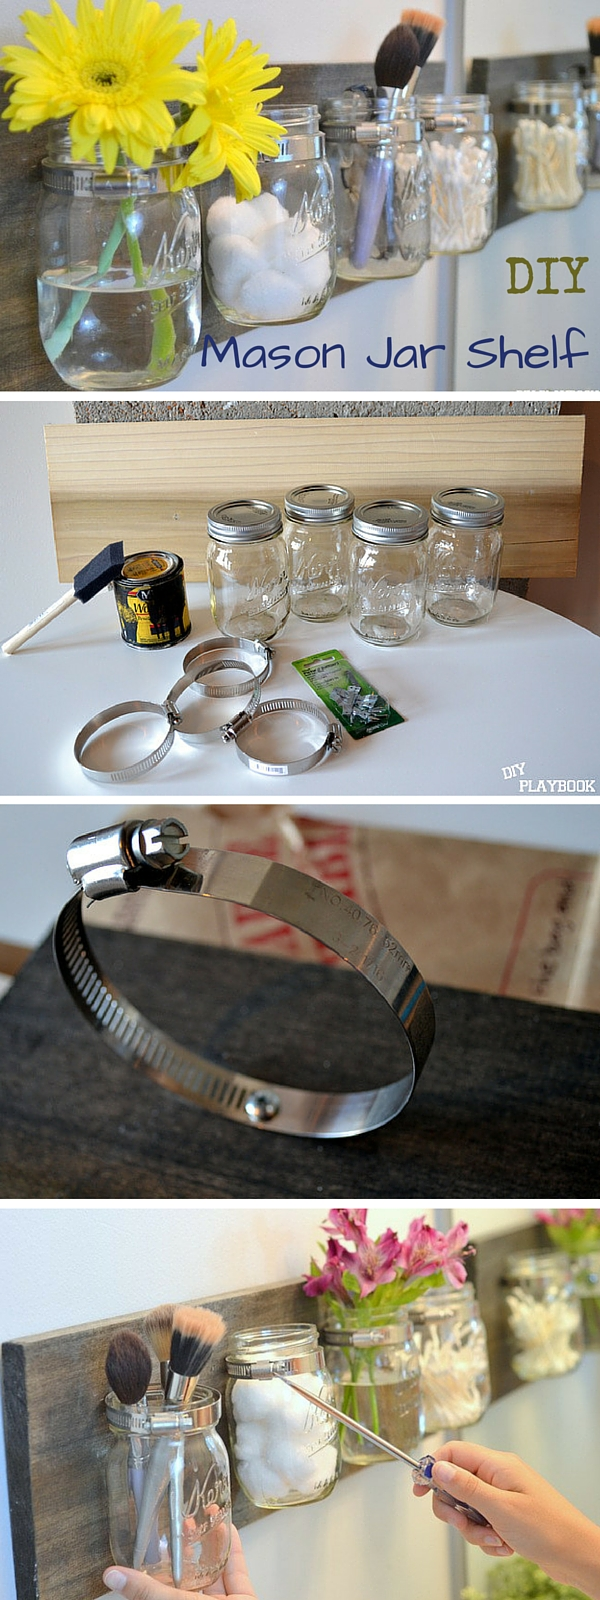 #DIY Mason Jar Shelves #bathroomdecor